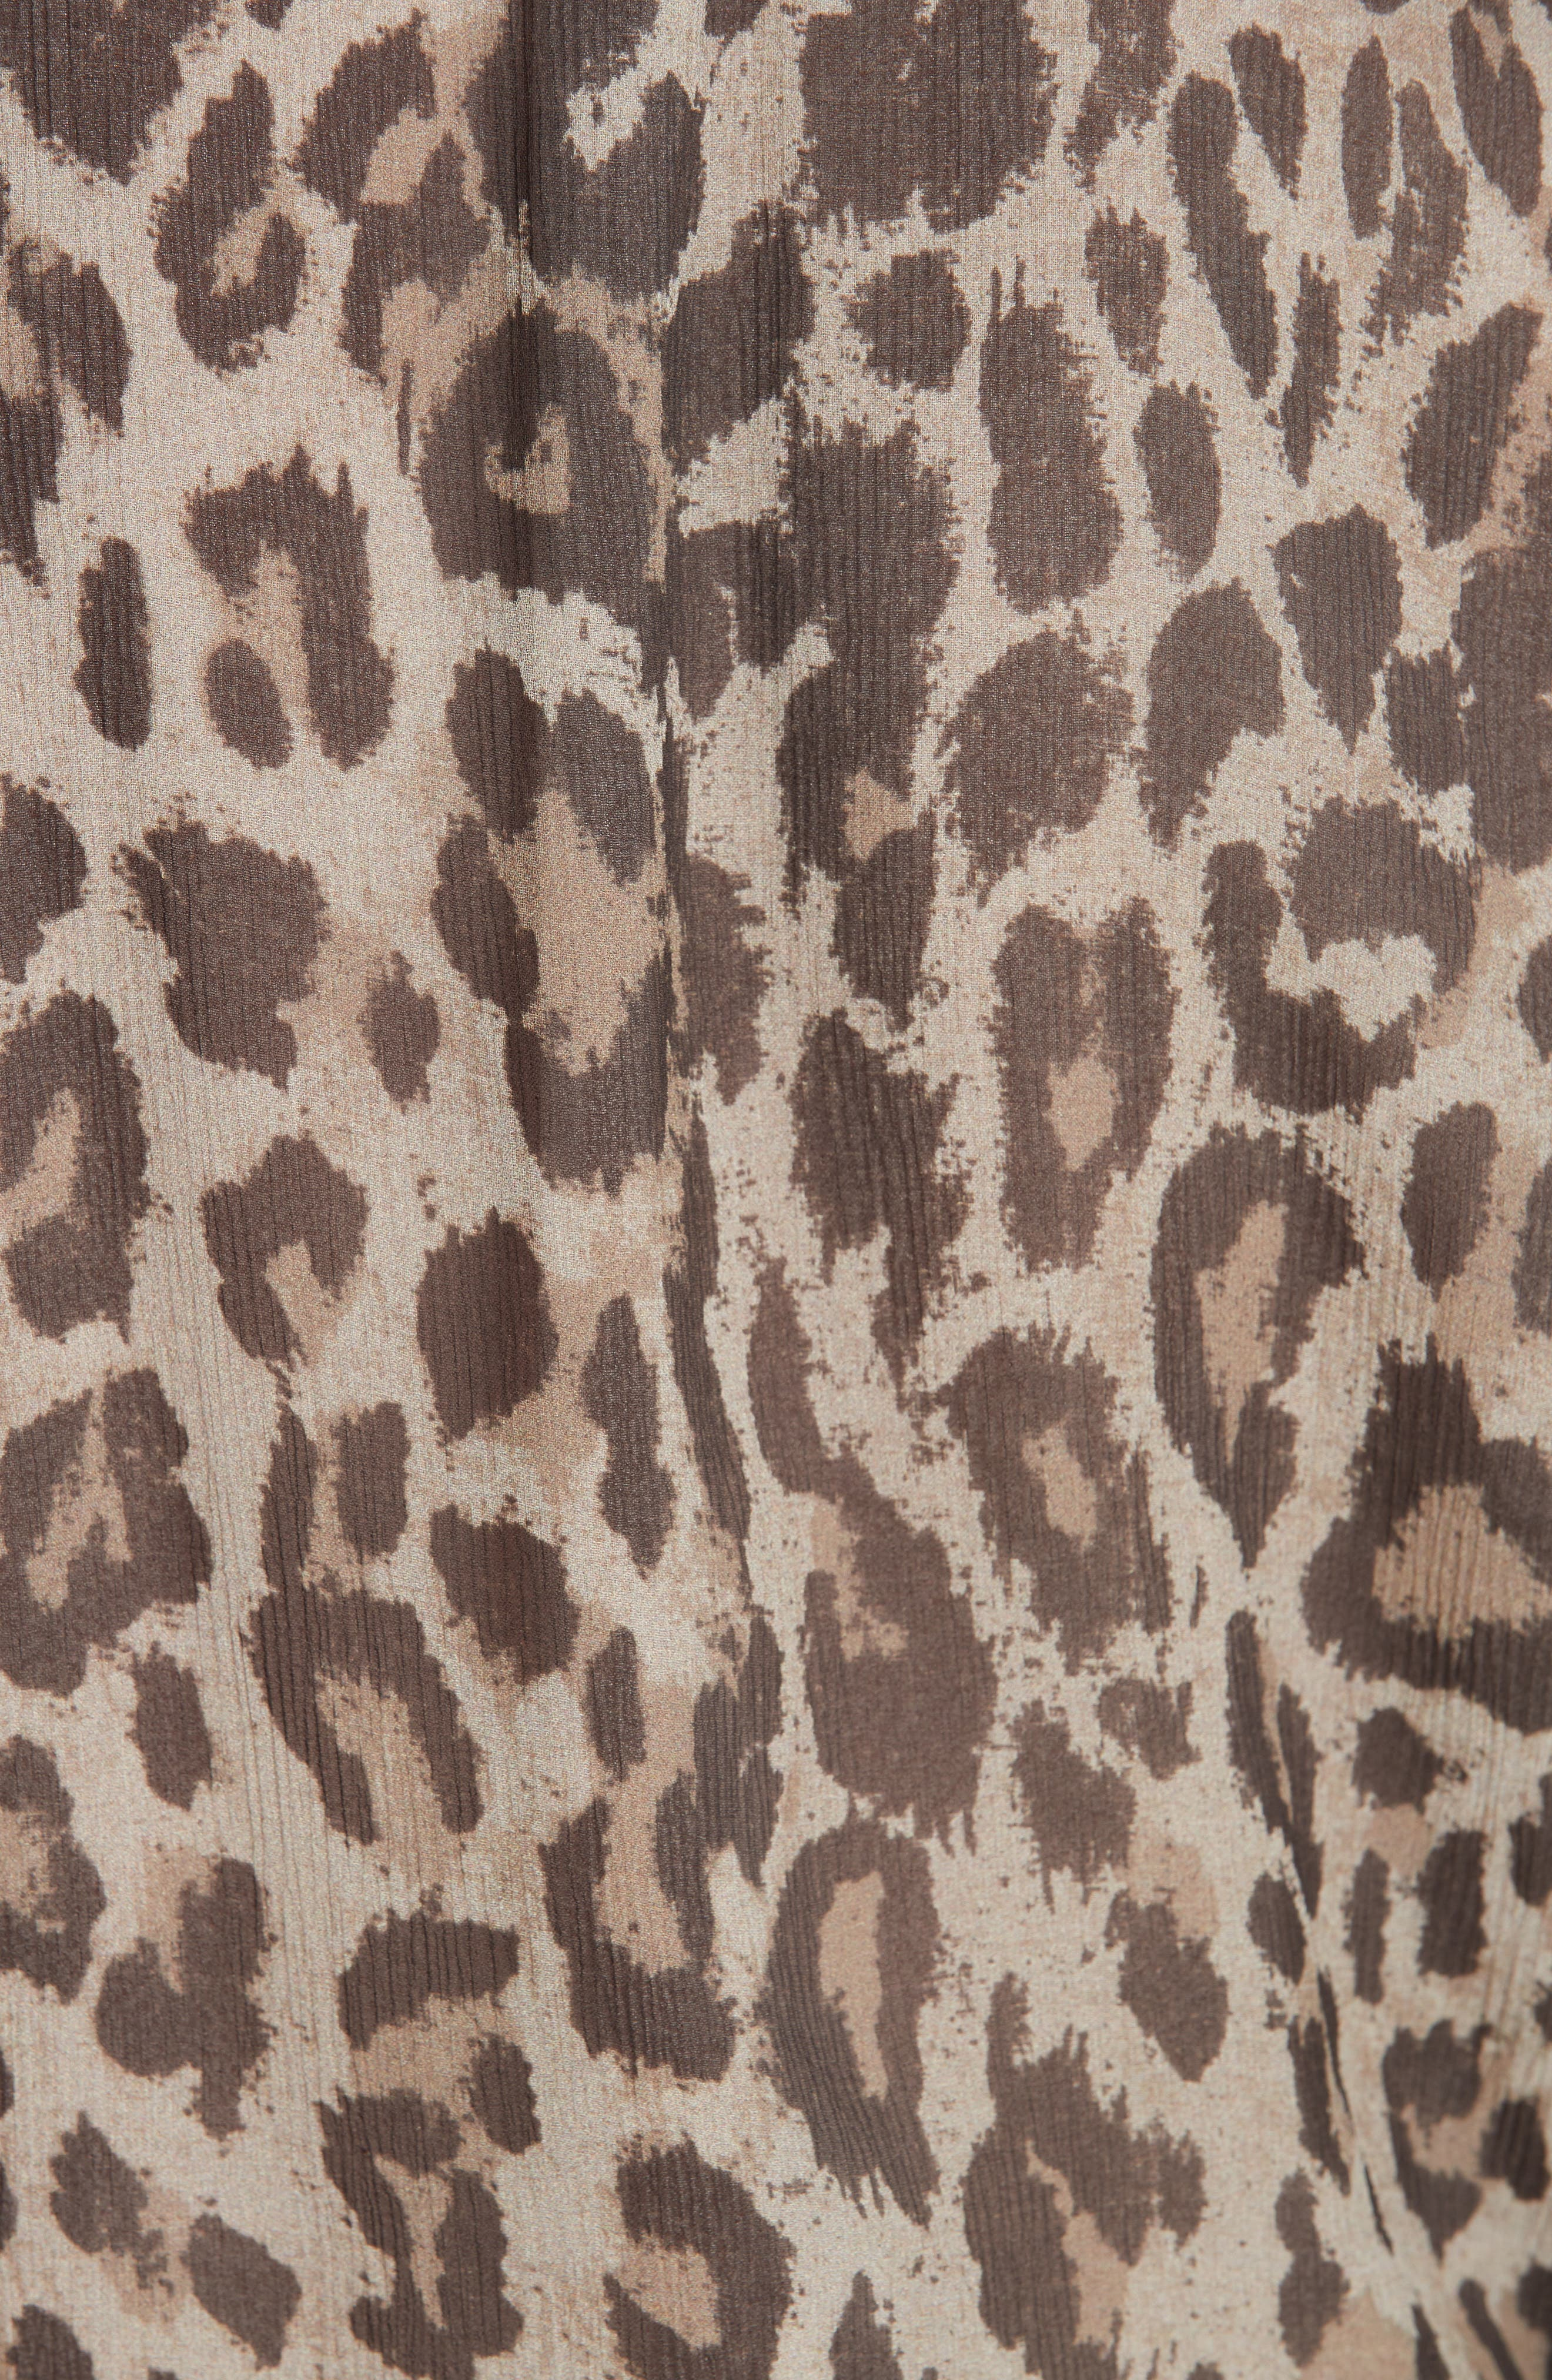 Leopard Print Silk Wrap Top,                             Alternate thumbnail 5, color,                             200